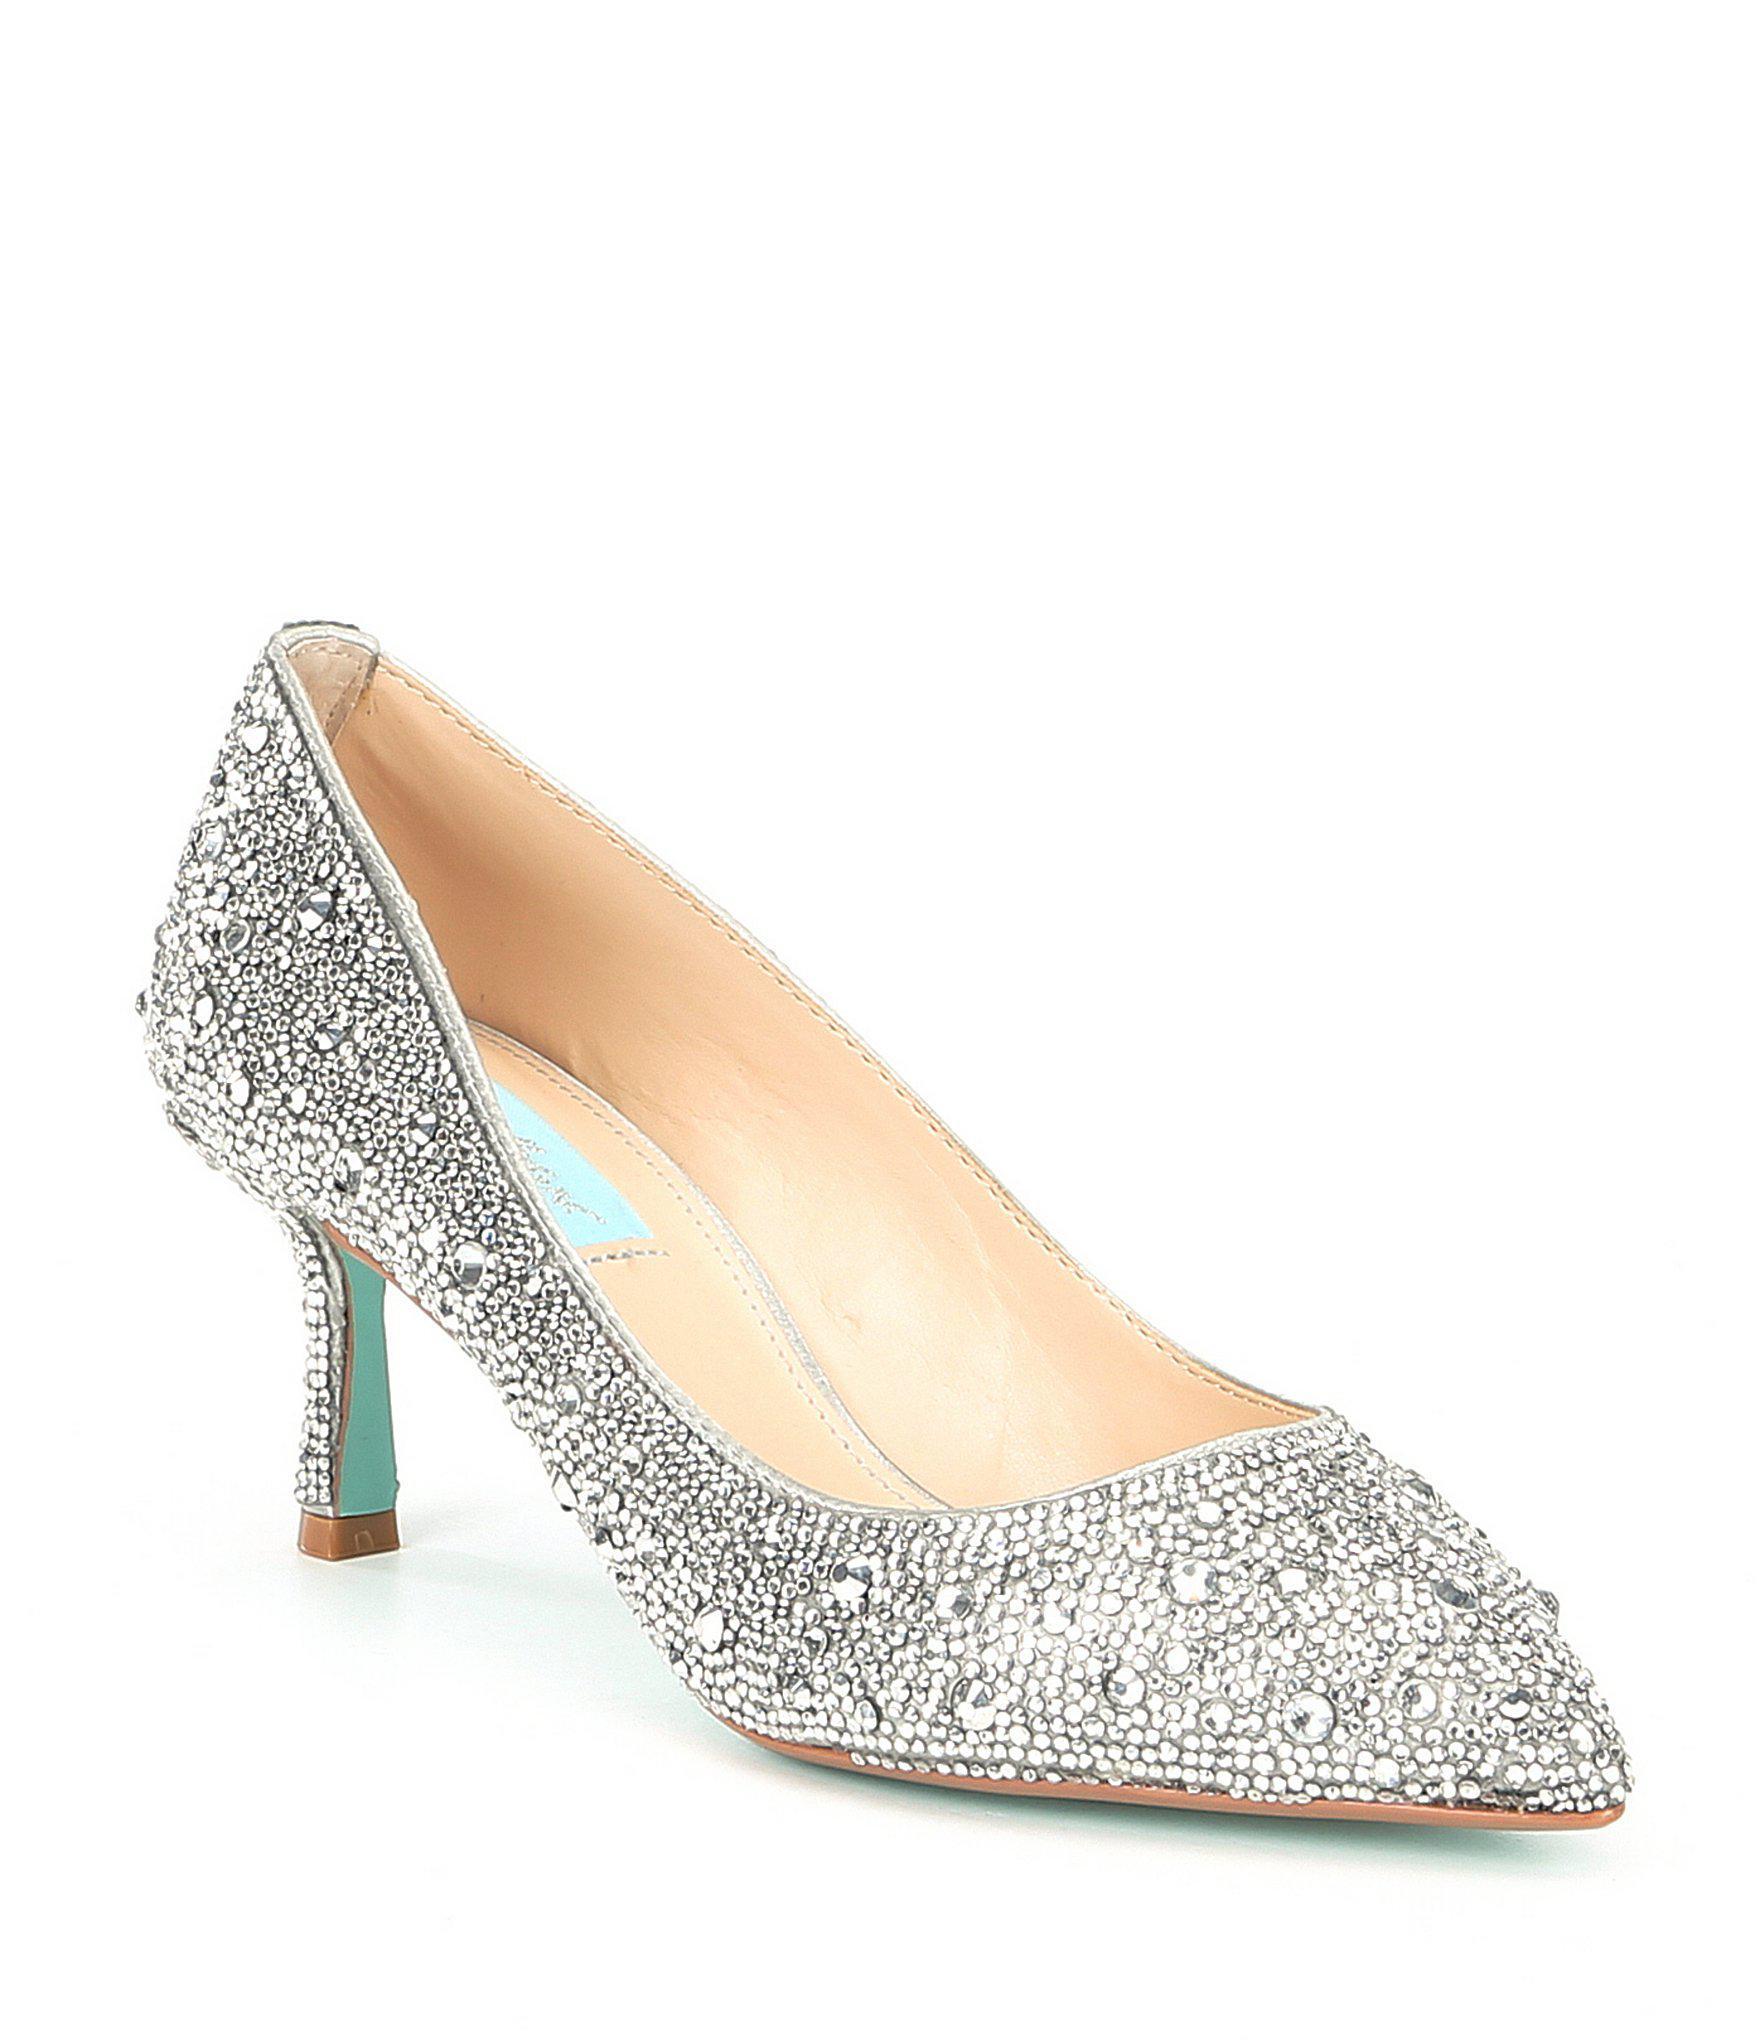 7b6ce7fa1cf Betsey Johnson. Women s Metallic Blue By Jora Glitter Jeweled Kitten Heel  Pumps